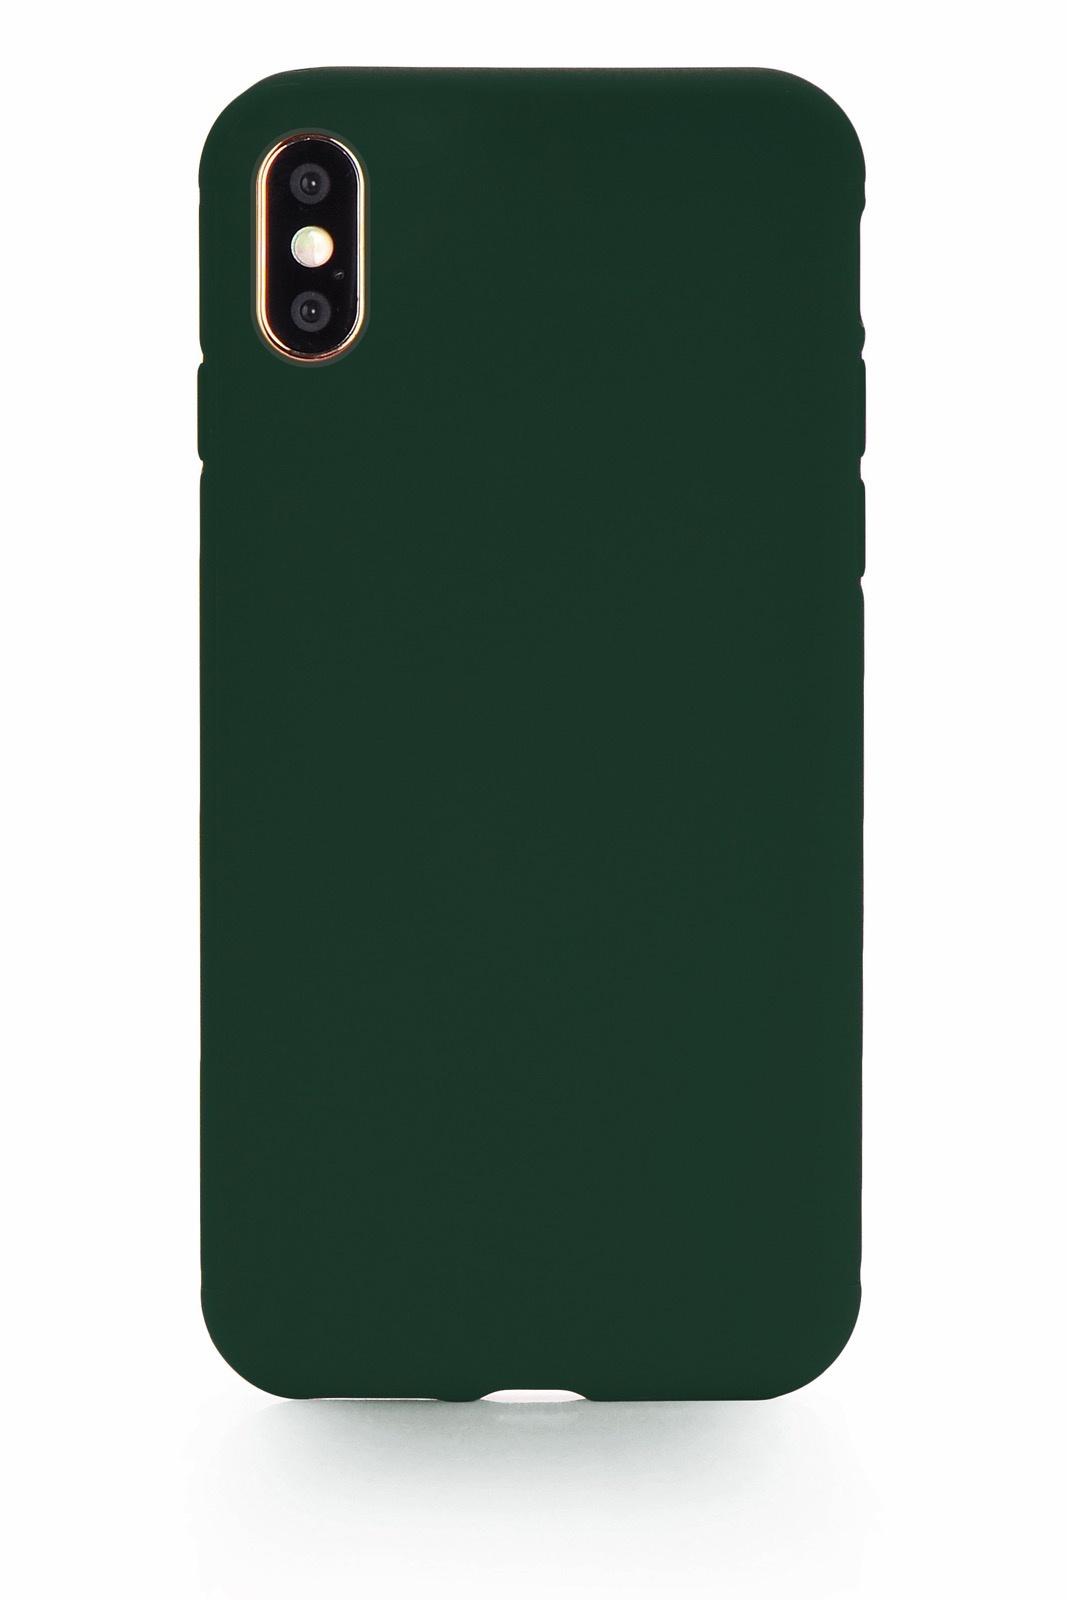 "Чехол для сотового телефона Gurdini Soft Lux силикон (14) для iPhone XS Max 6.5"", темно-зеленый"